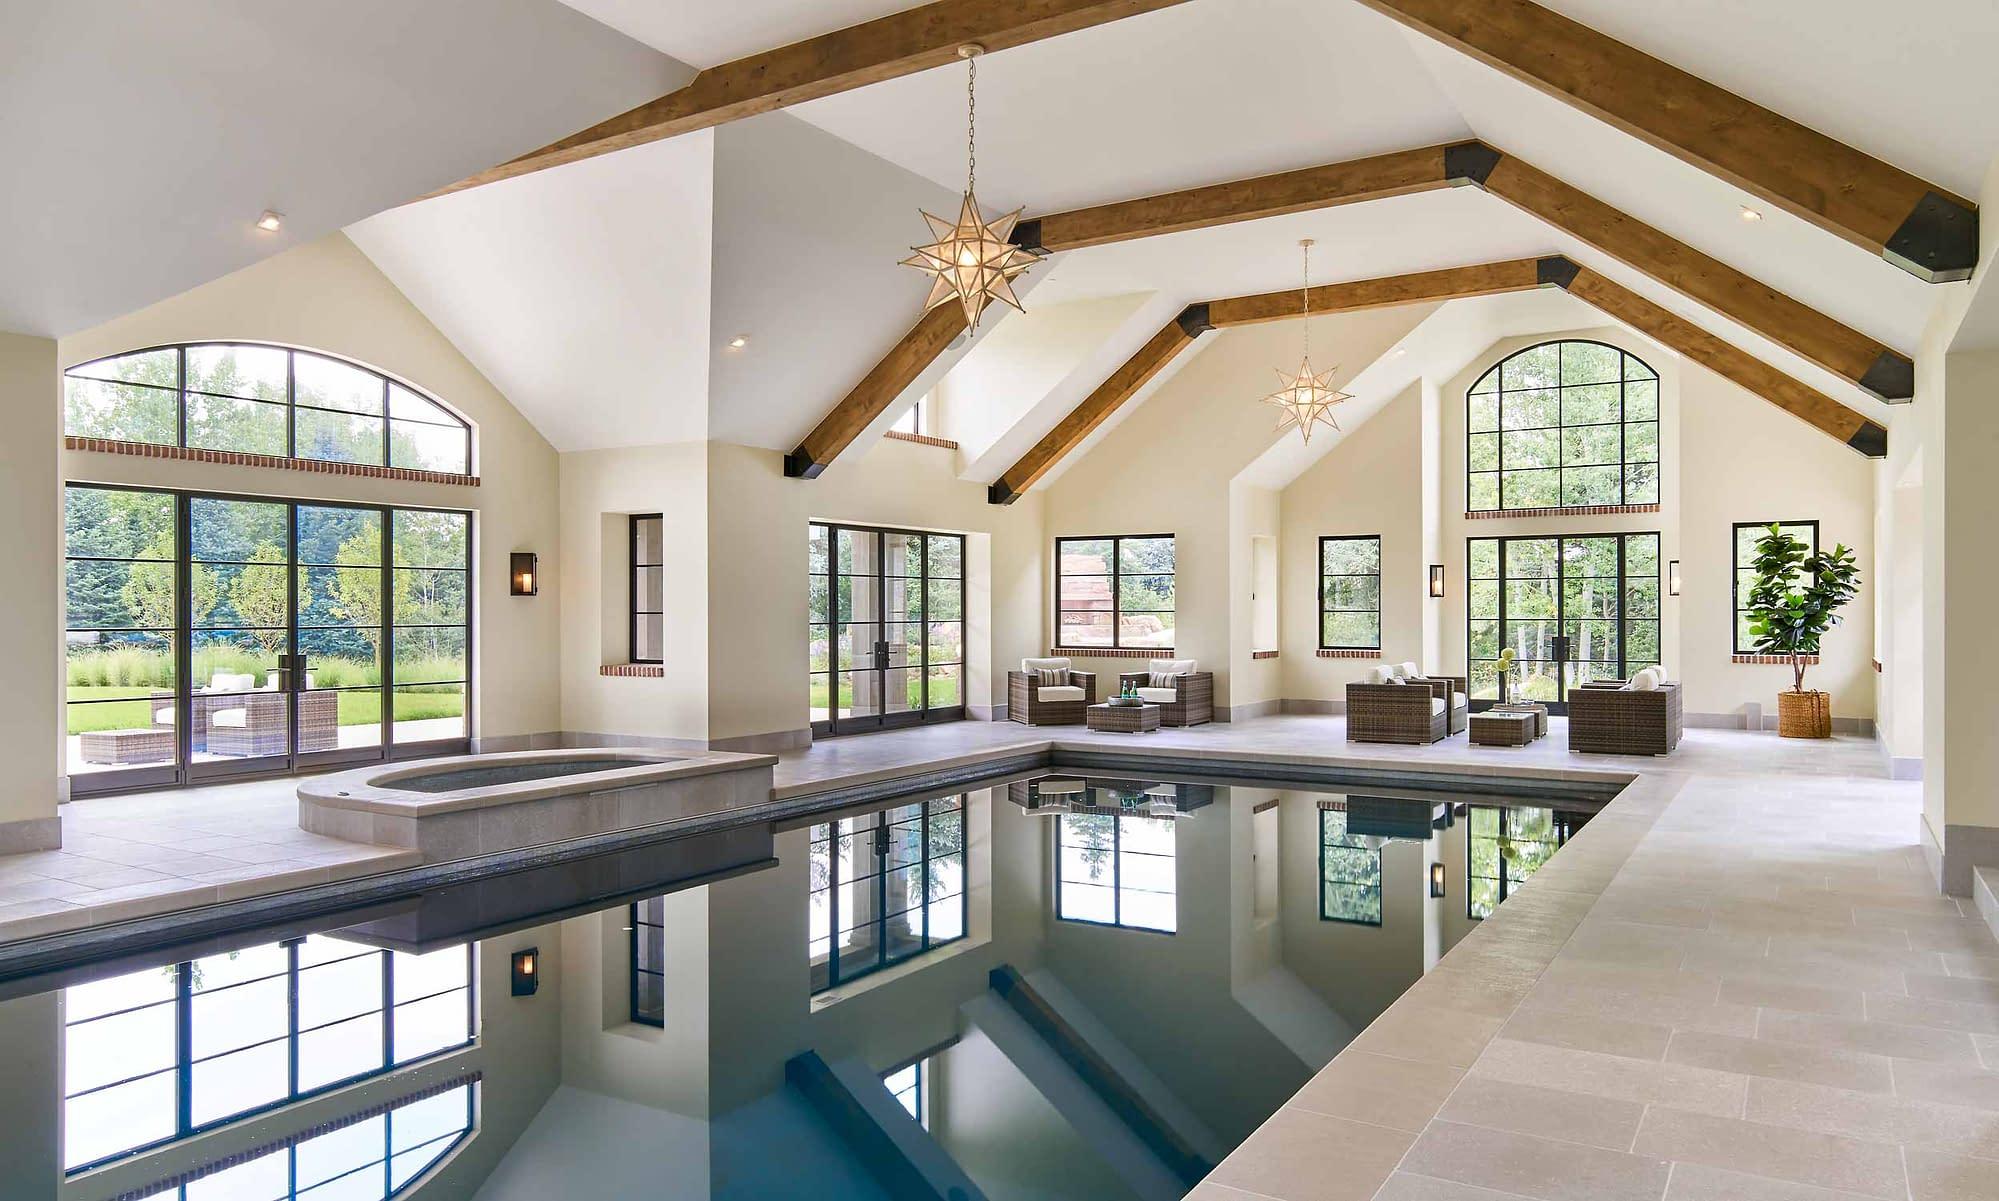 Brombal's custom luxury metal windows and doors are featured in this indoor pool